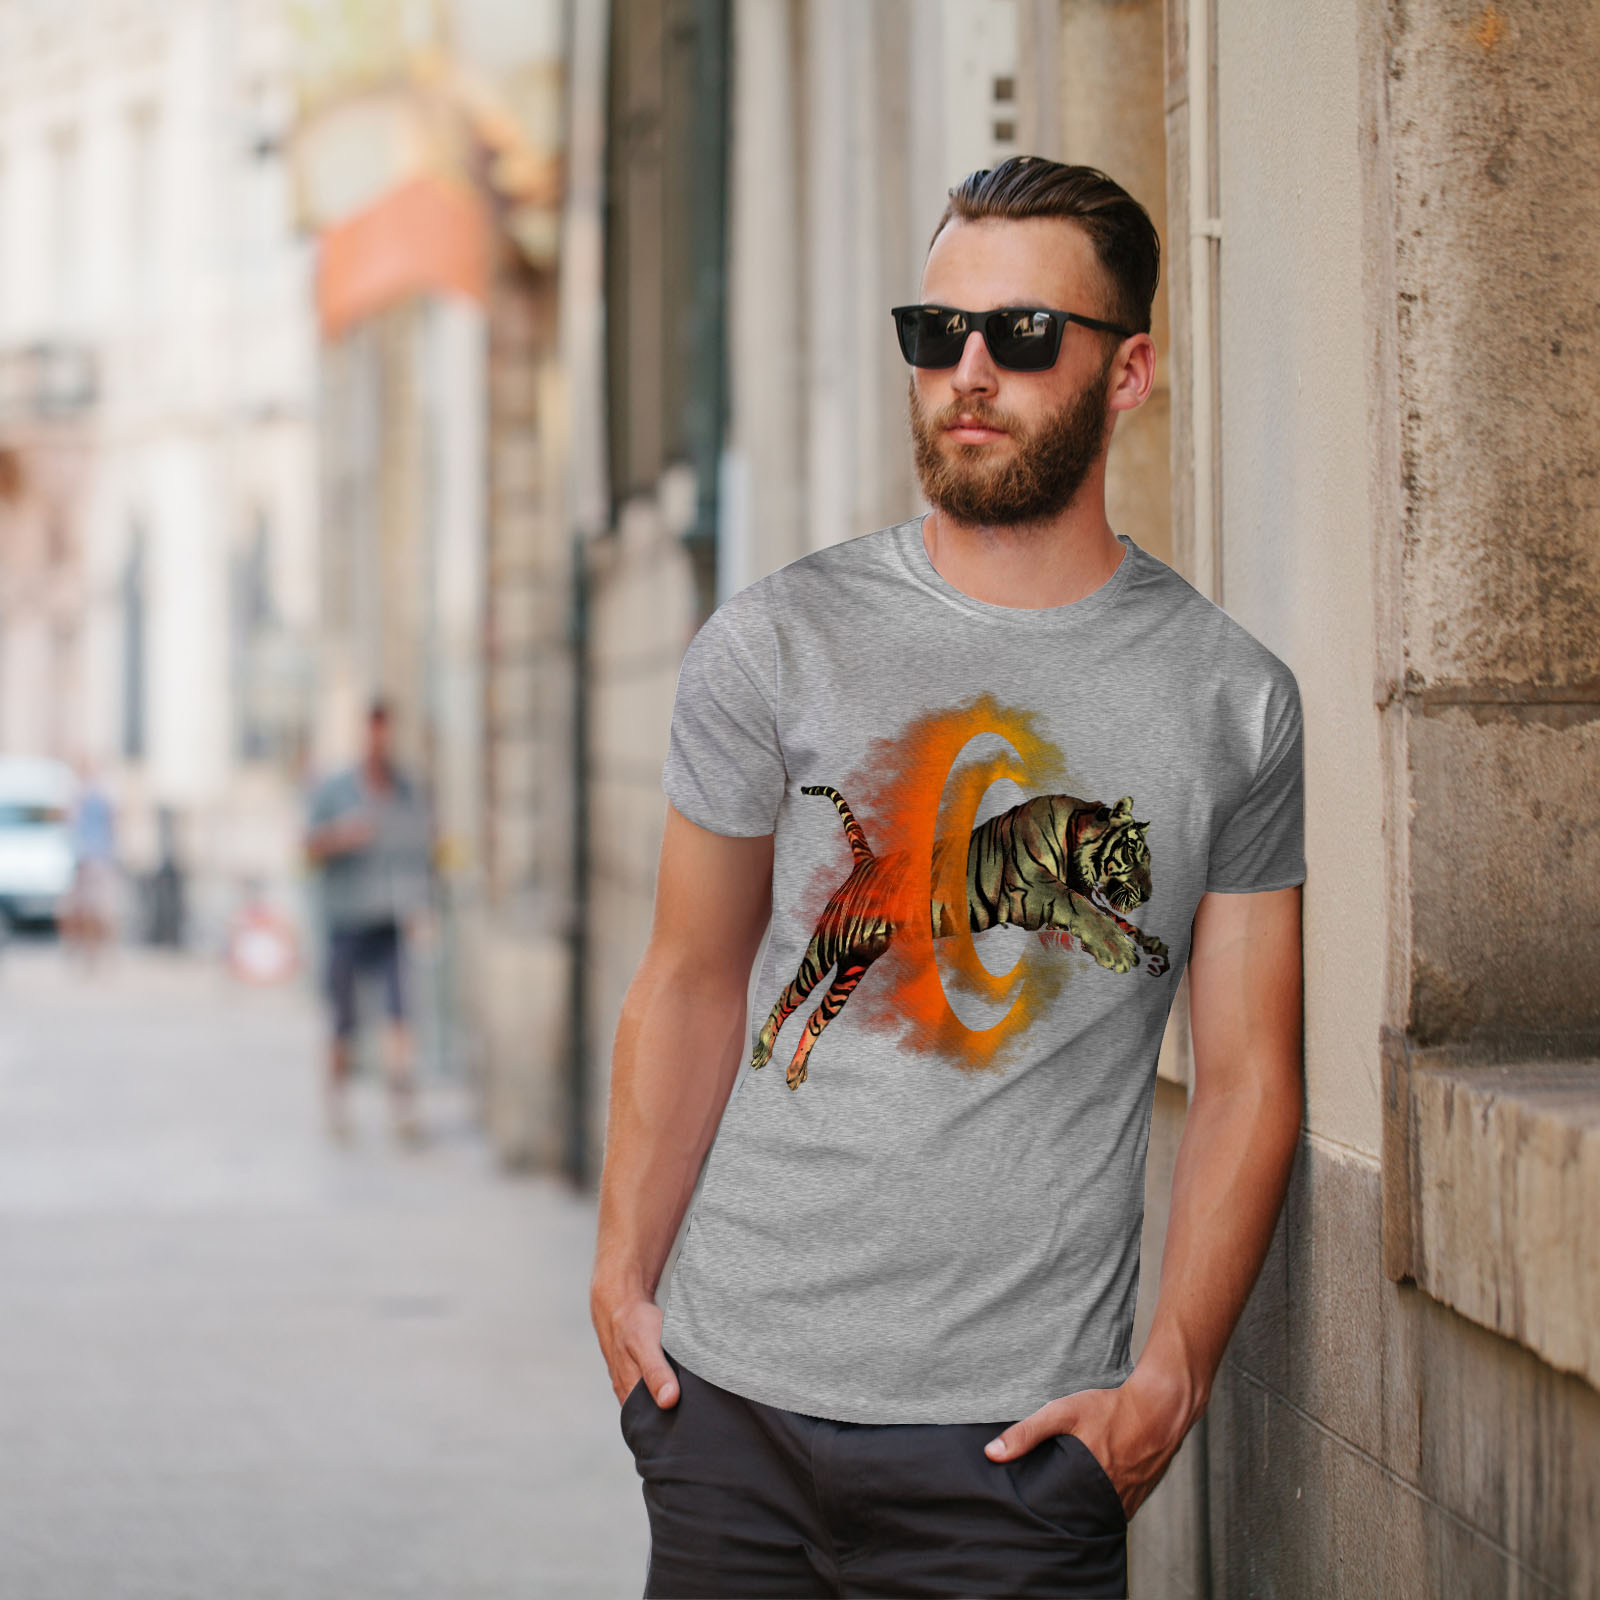 Wellcoda-Tiger-Portal-Cool-Mens-T-shirt-Flame-Graphic-Design-Printed-Tee thumbnail 17